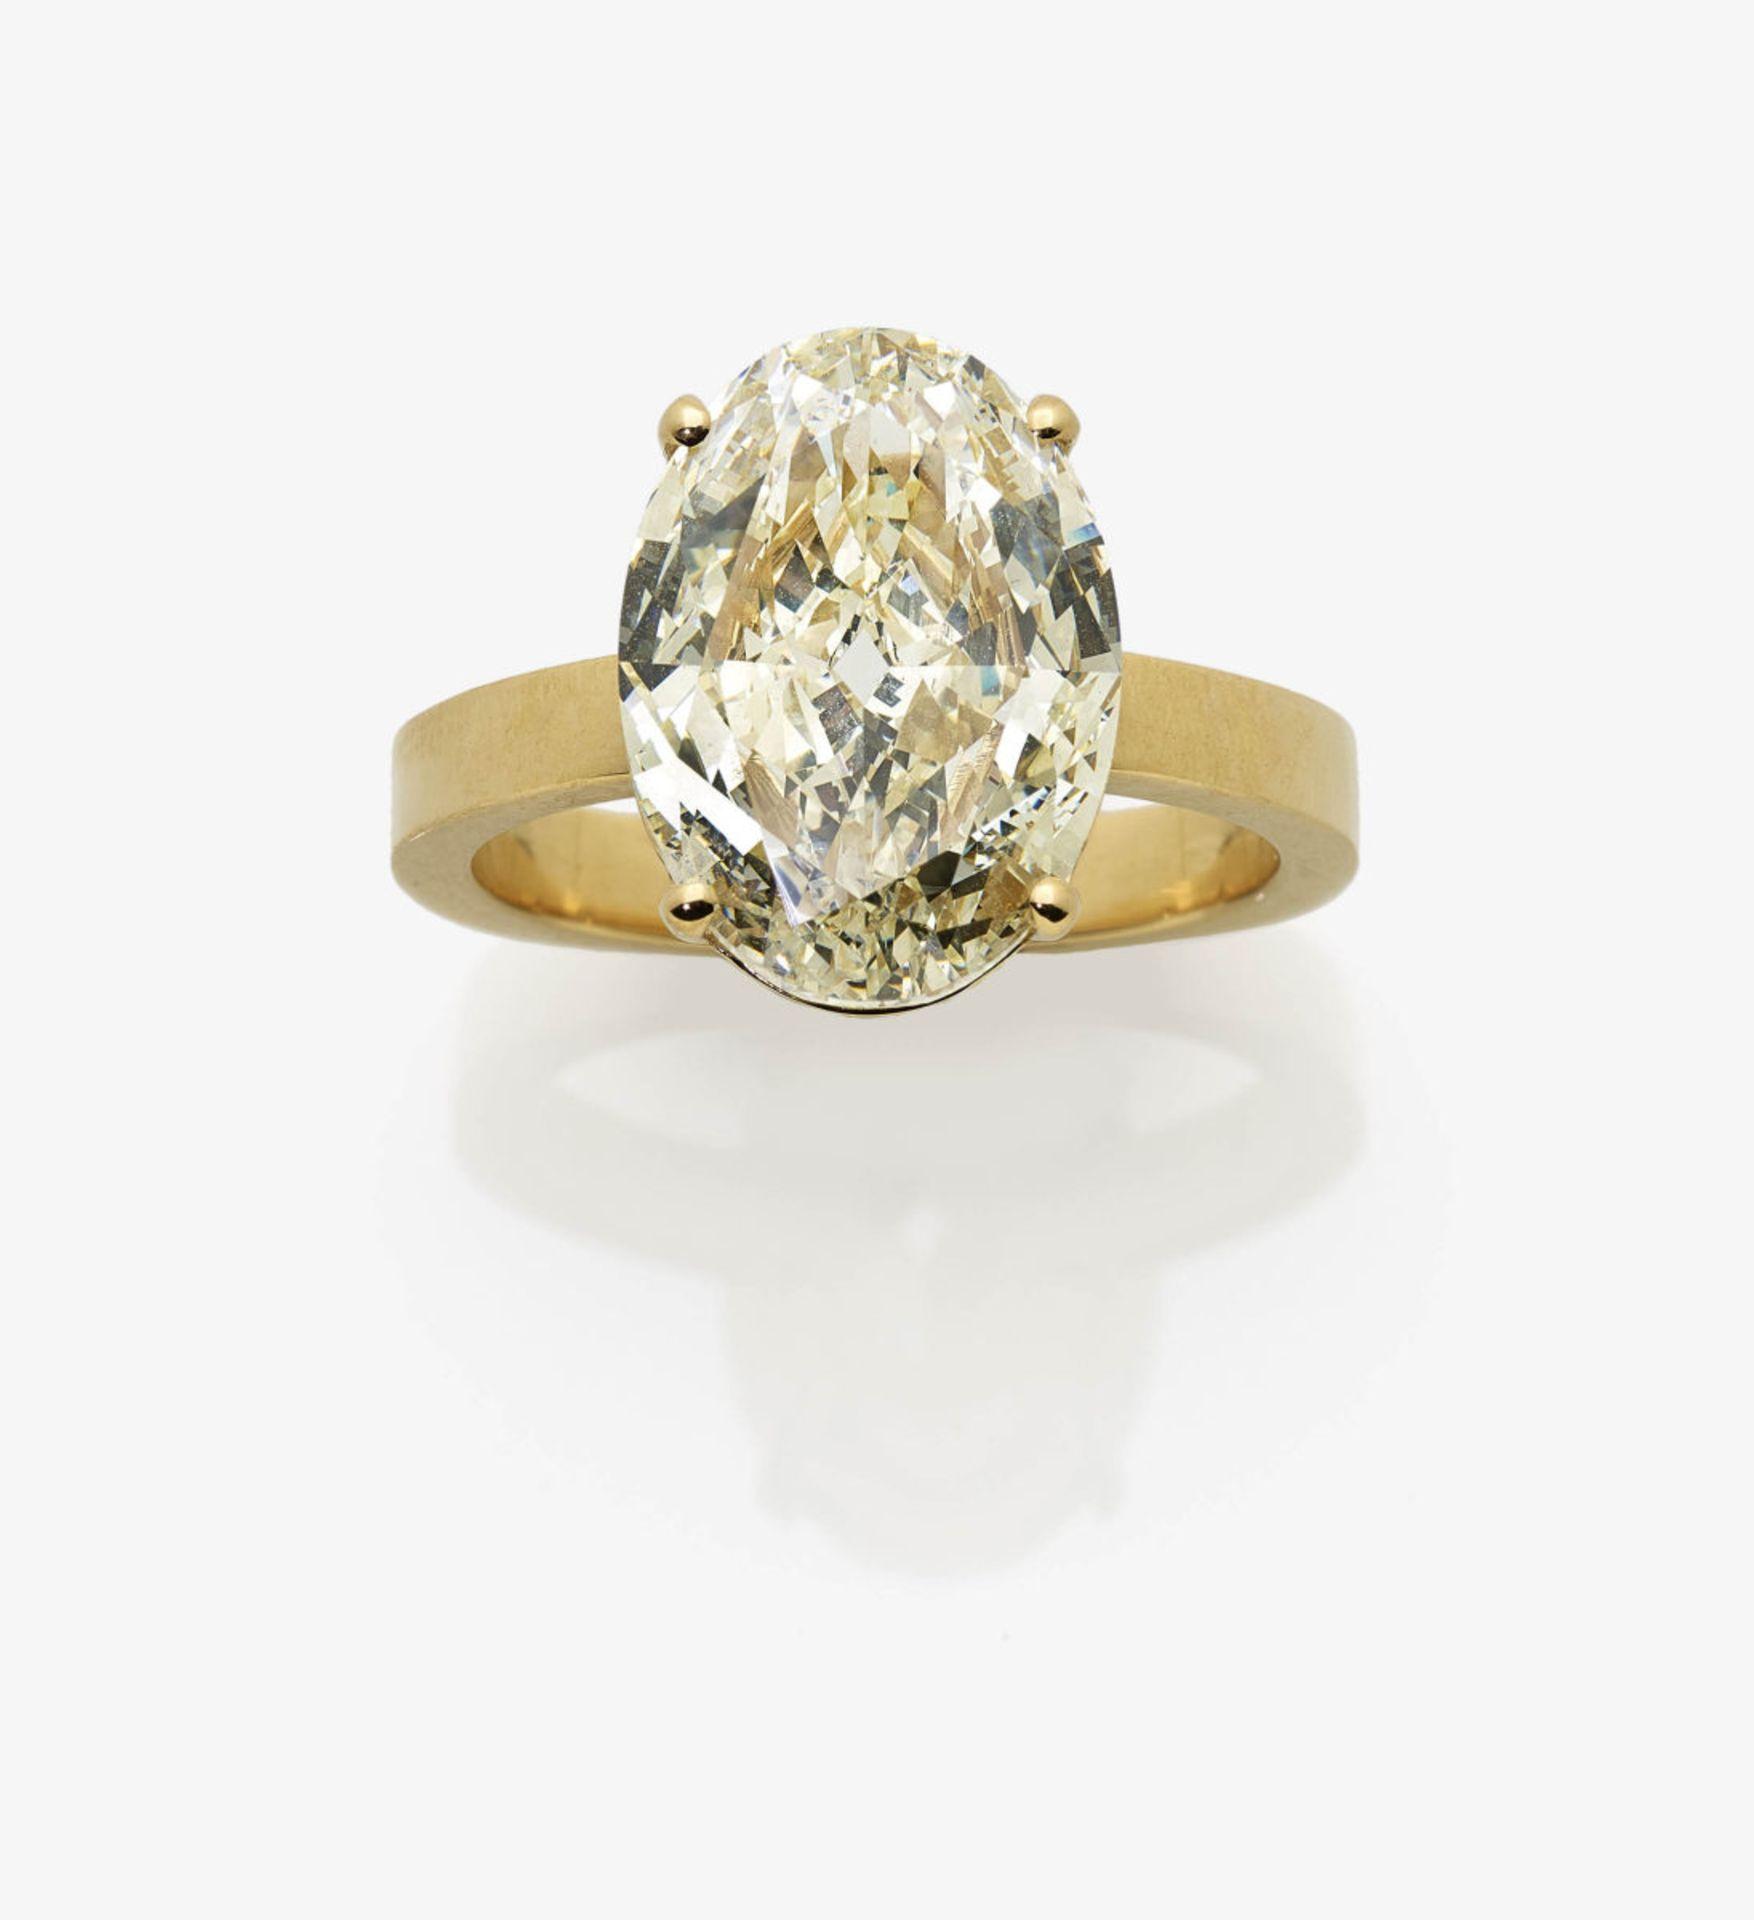 Los 1031 - A Champagne-Coloured Diamond Solitaire Ring